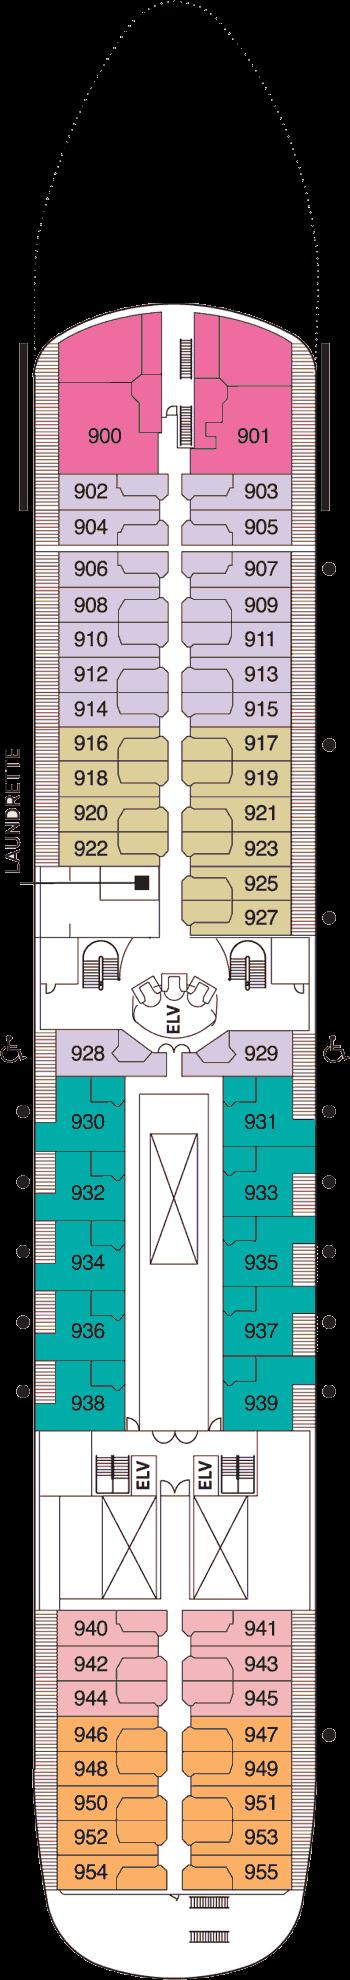 Seven Seas Navigator - Deck 9